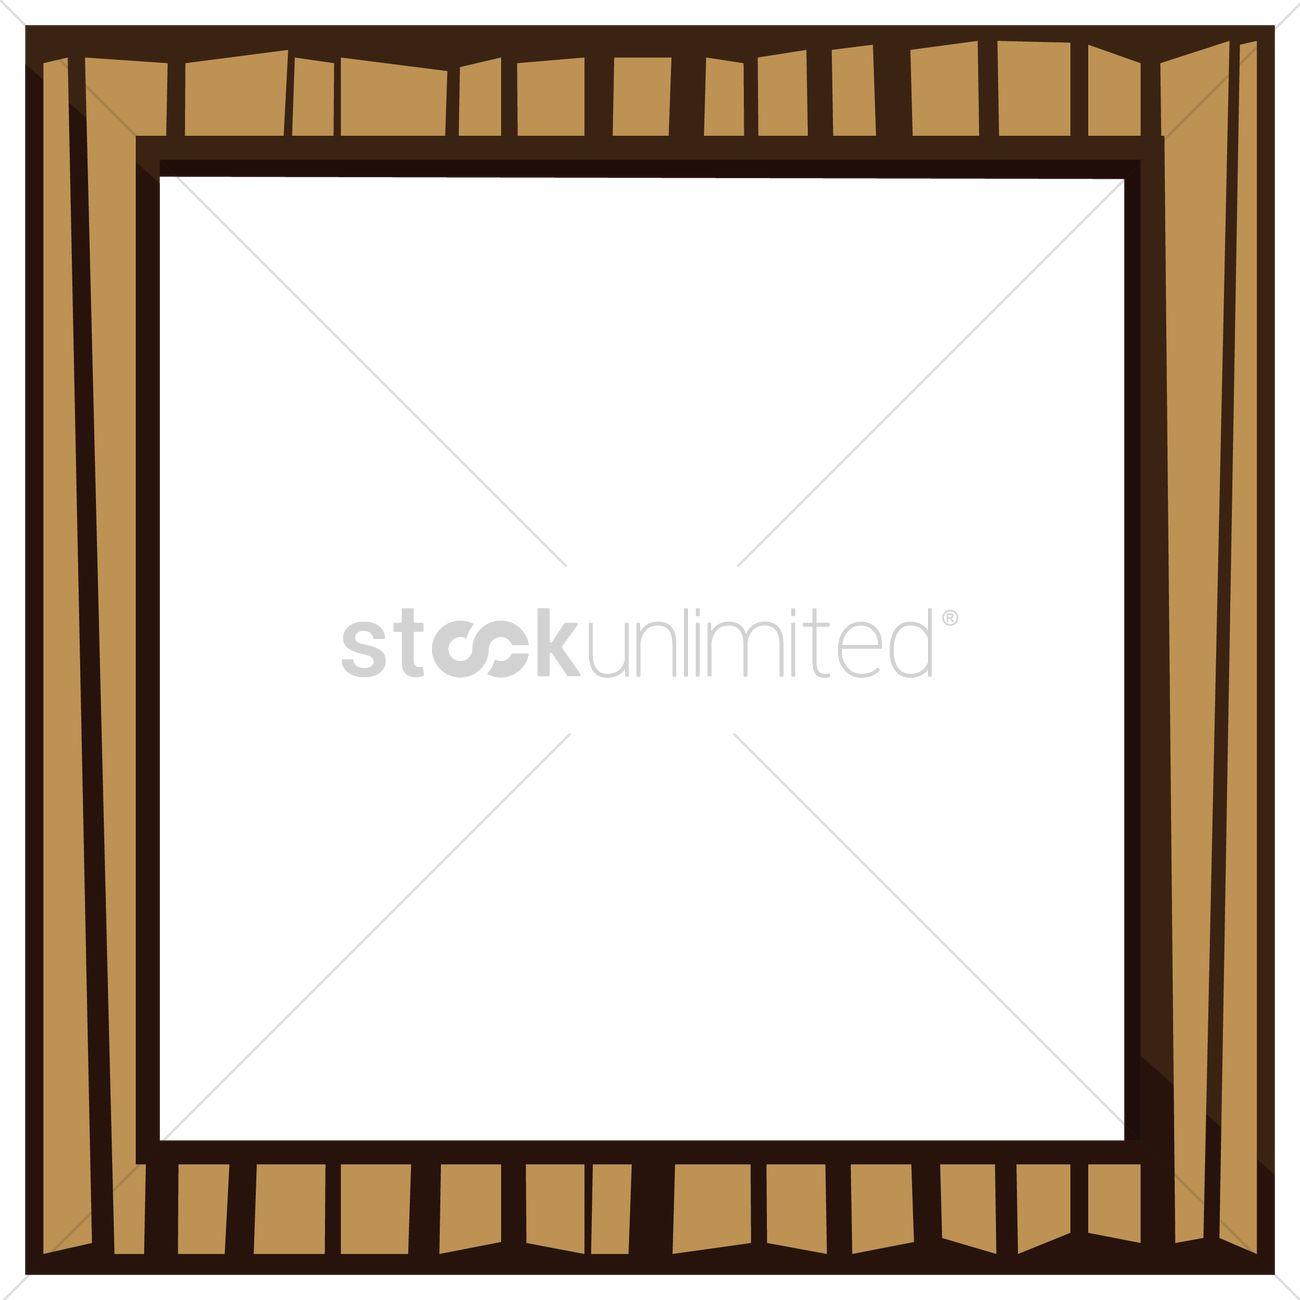 Rectangular Frame Vector Image 1479080 Stockunlimited